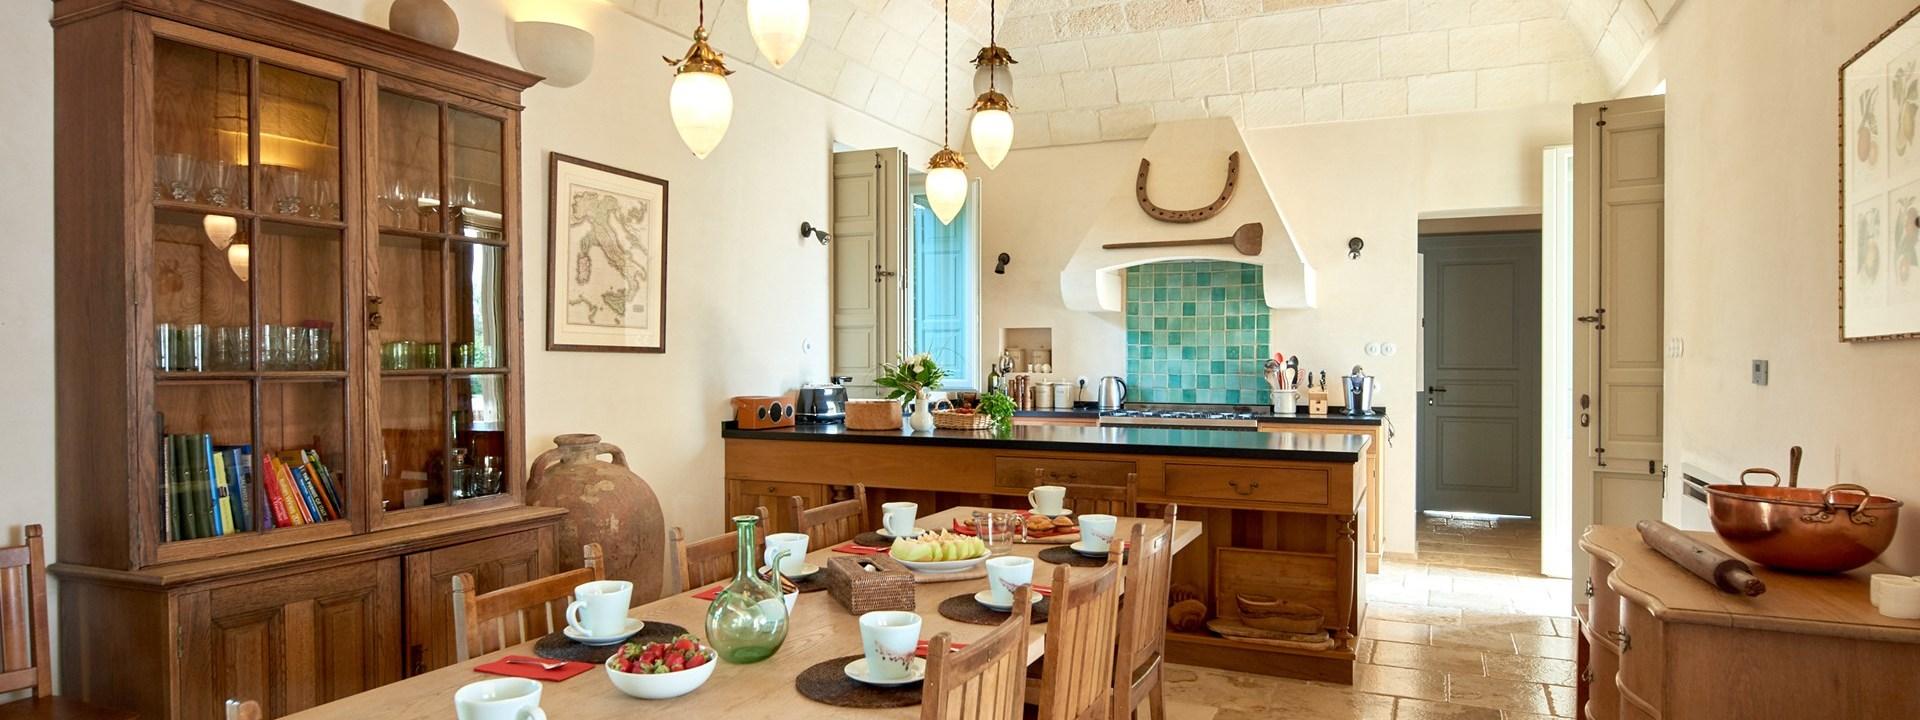 masseria-coloniale-kitchen-dining